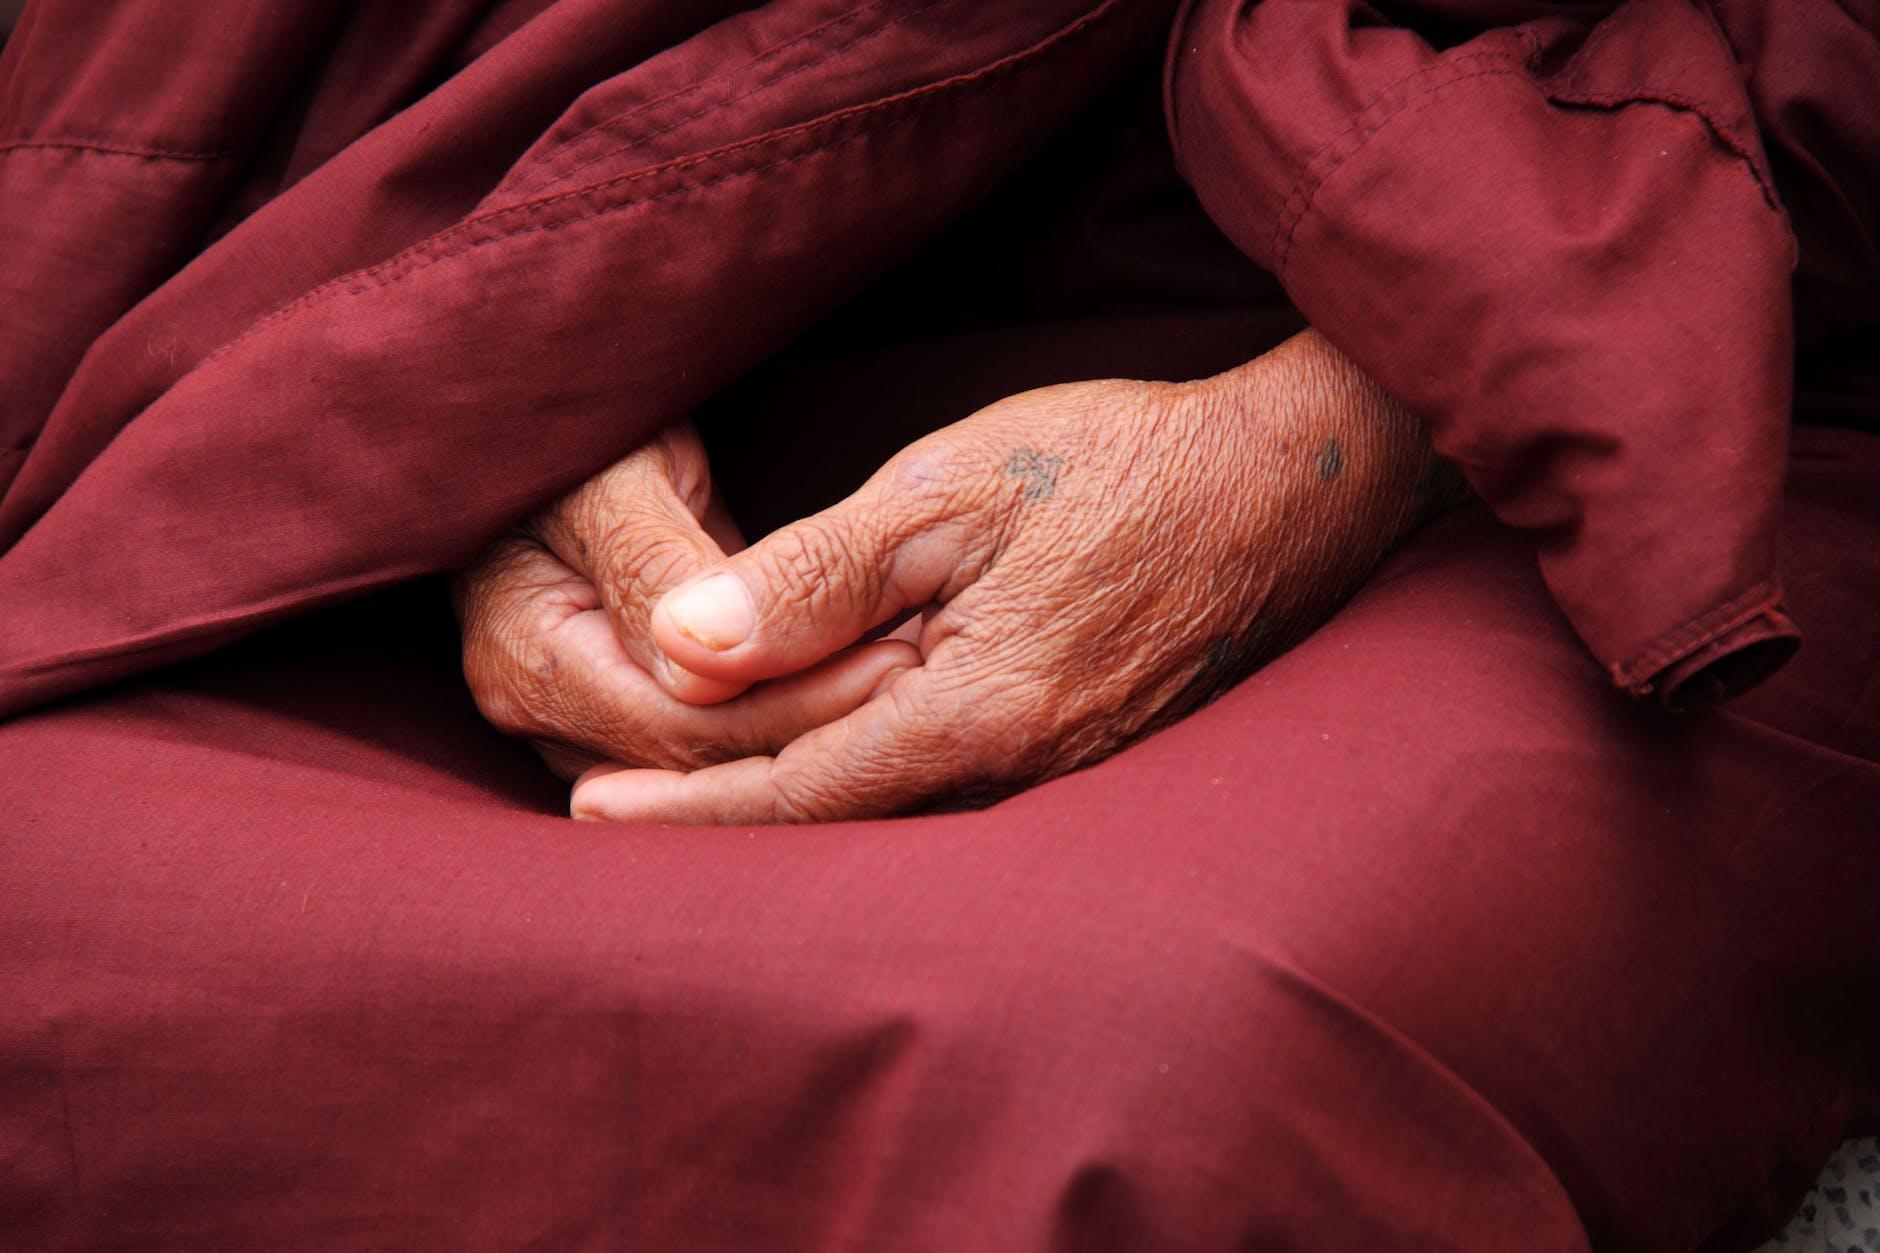 Pratītyasamutpāda laws of karma